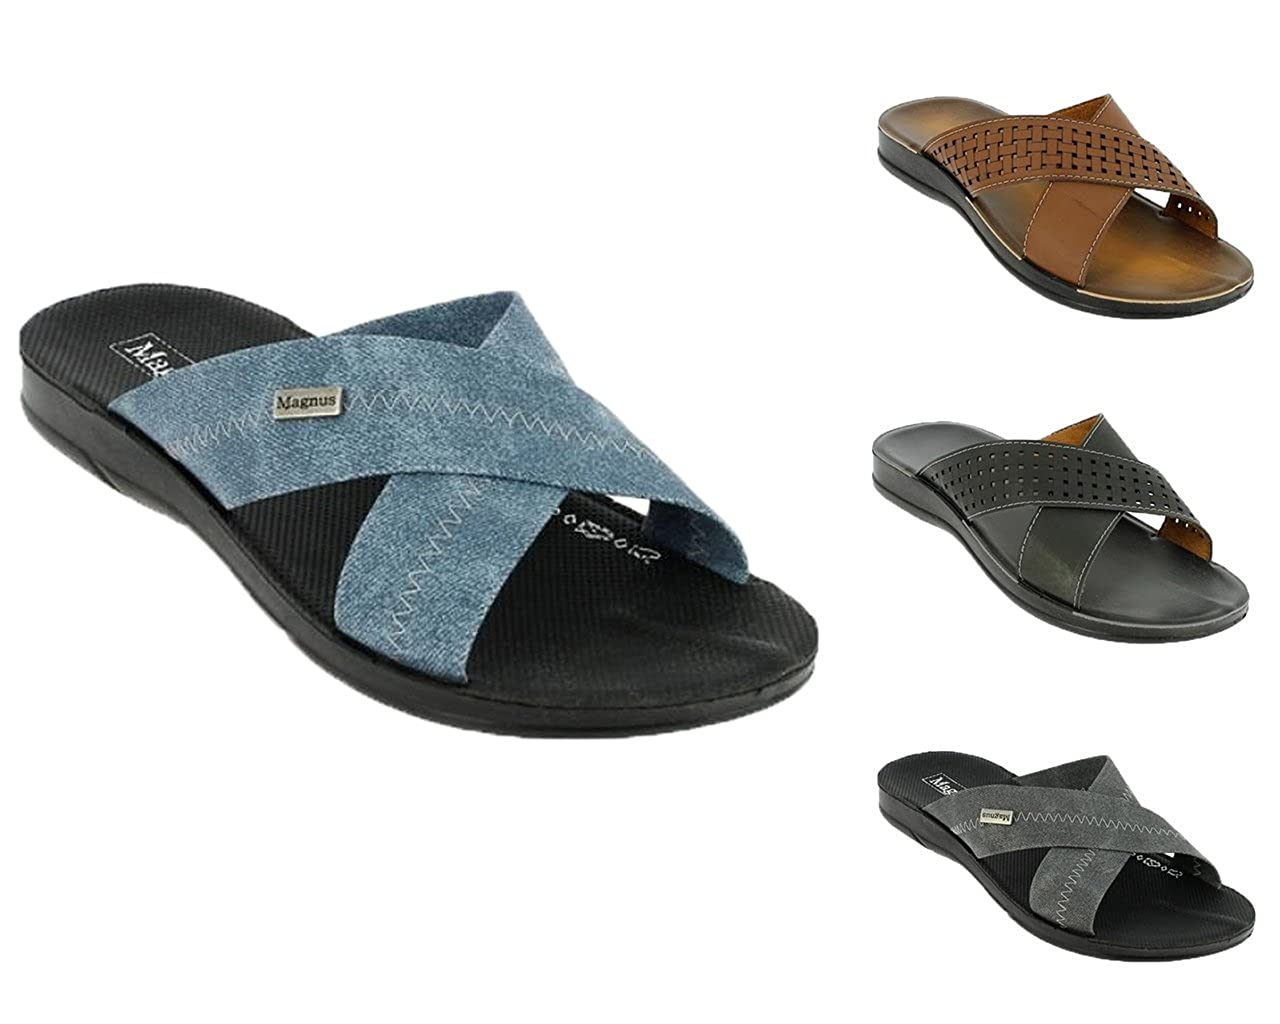 bd91fe03f466 Herren Pantoletten Classic Hausschuhe Sandalen Schlappen Latschen Freizeit  Arbeit Komfort Schuhe   BA640120  Amazon.de  Schuhe   Handtaschen